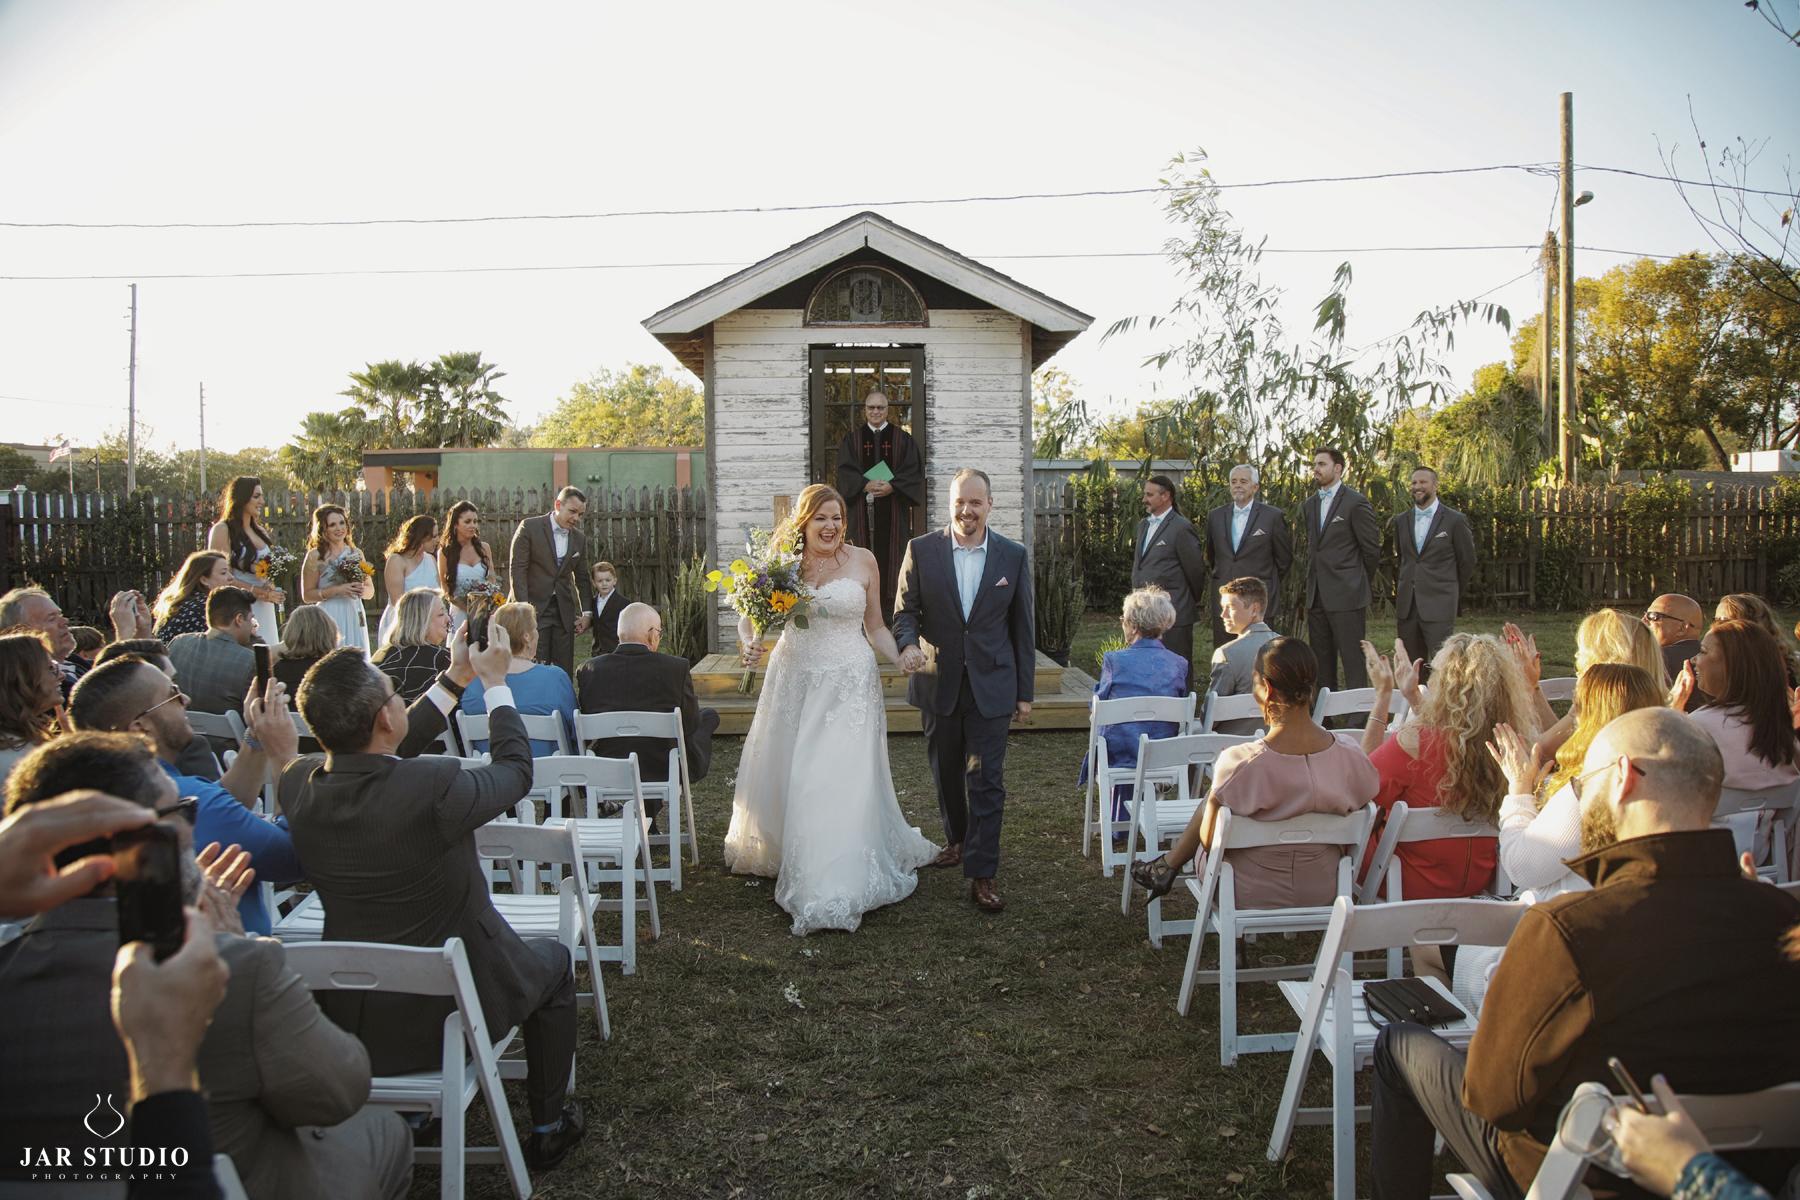 26-beautiful-for-sunset-wedding-the-acre-jarstudio.JPG